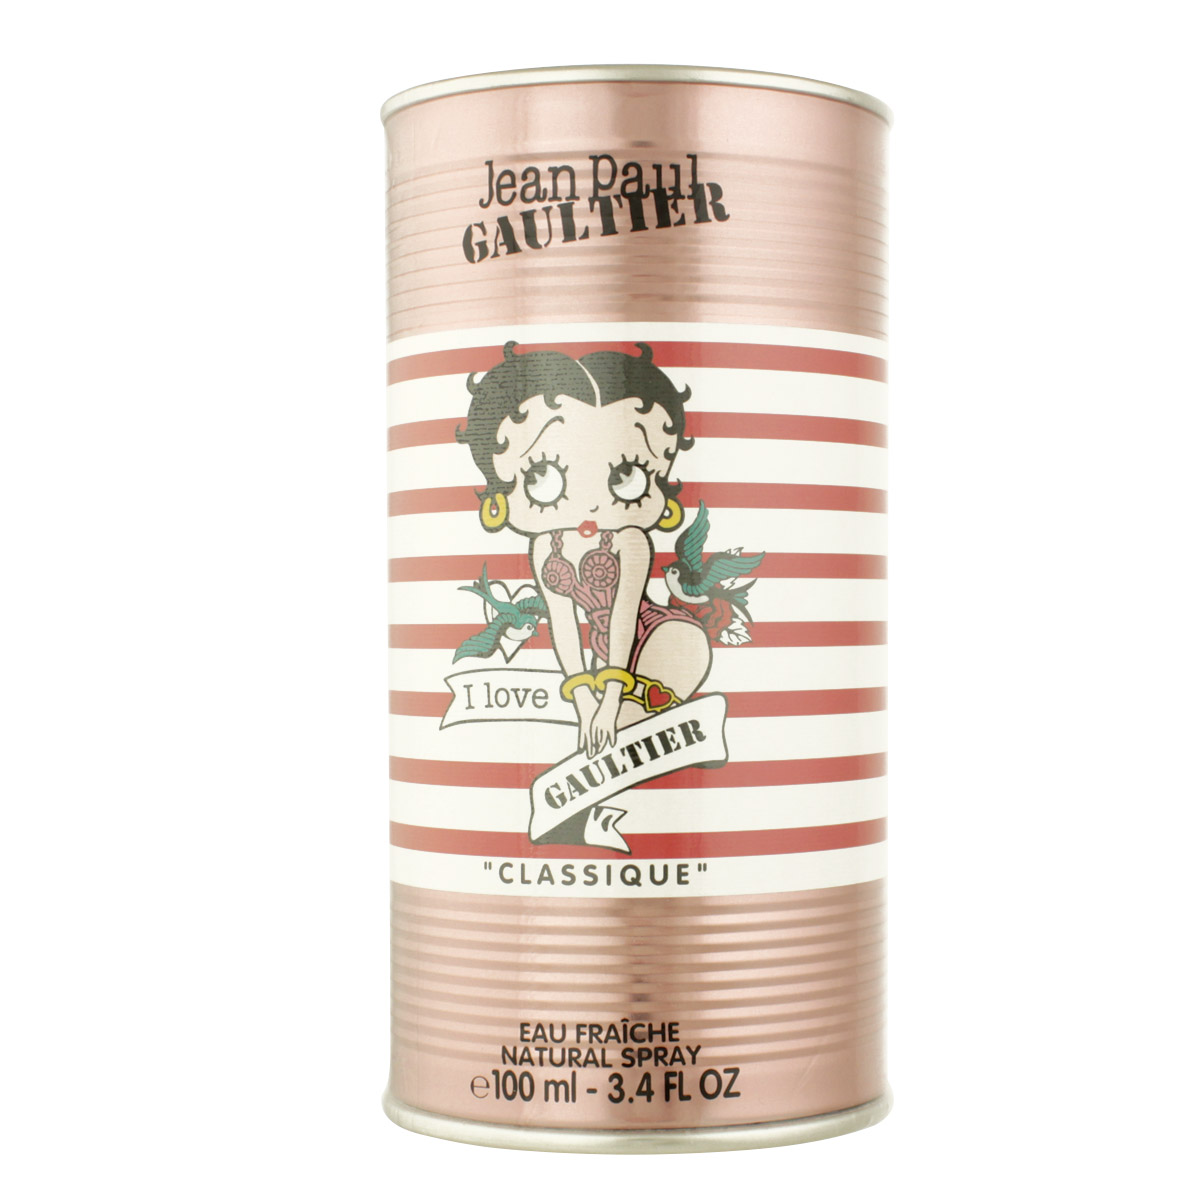 Jean Paul Gaultier Classique Betty Boop Eau Fraîche EDT 100 ml W